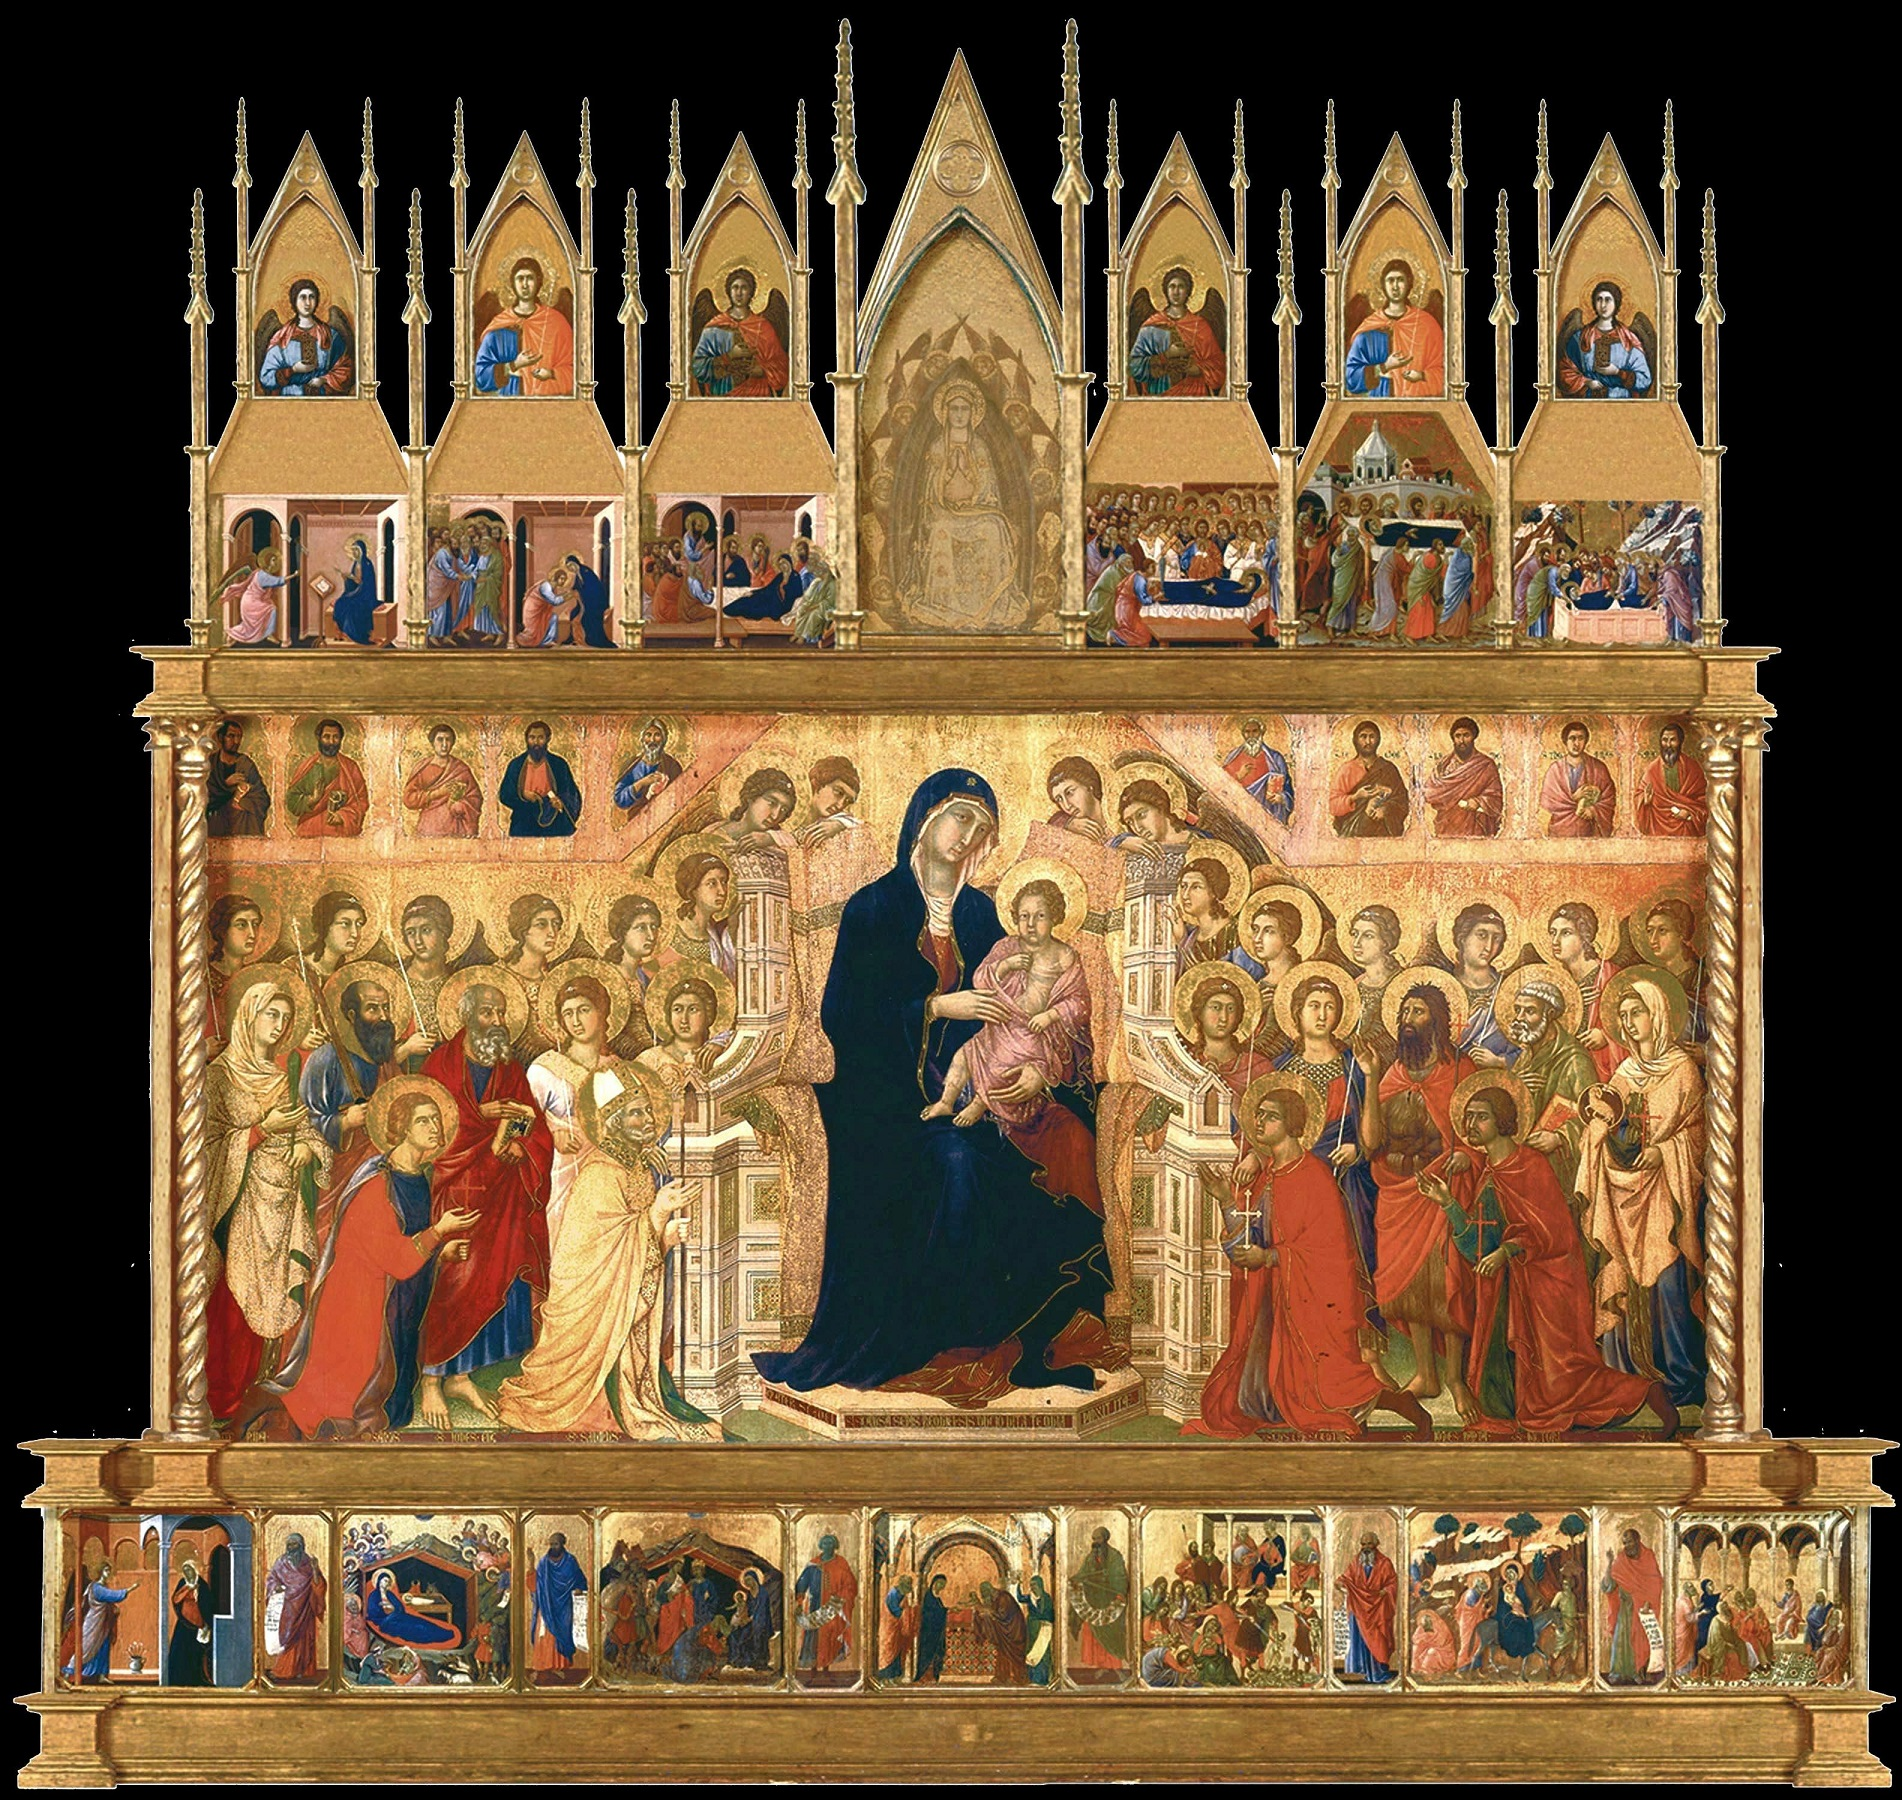 Duccio di Buoninsegna (ca 1255/60-ca 1318/19): Den store altertavlen «Maestà med tyve engler og nitten helgener», malt for høyalteret i katedralen i Siena (1308-11), nå i Museo dell'Opera Metropolitana i Siena